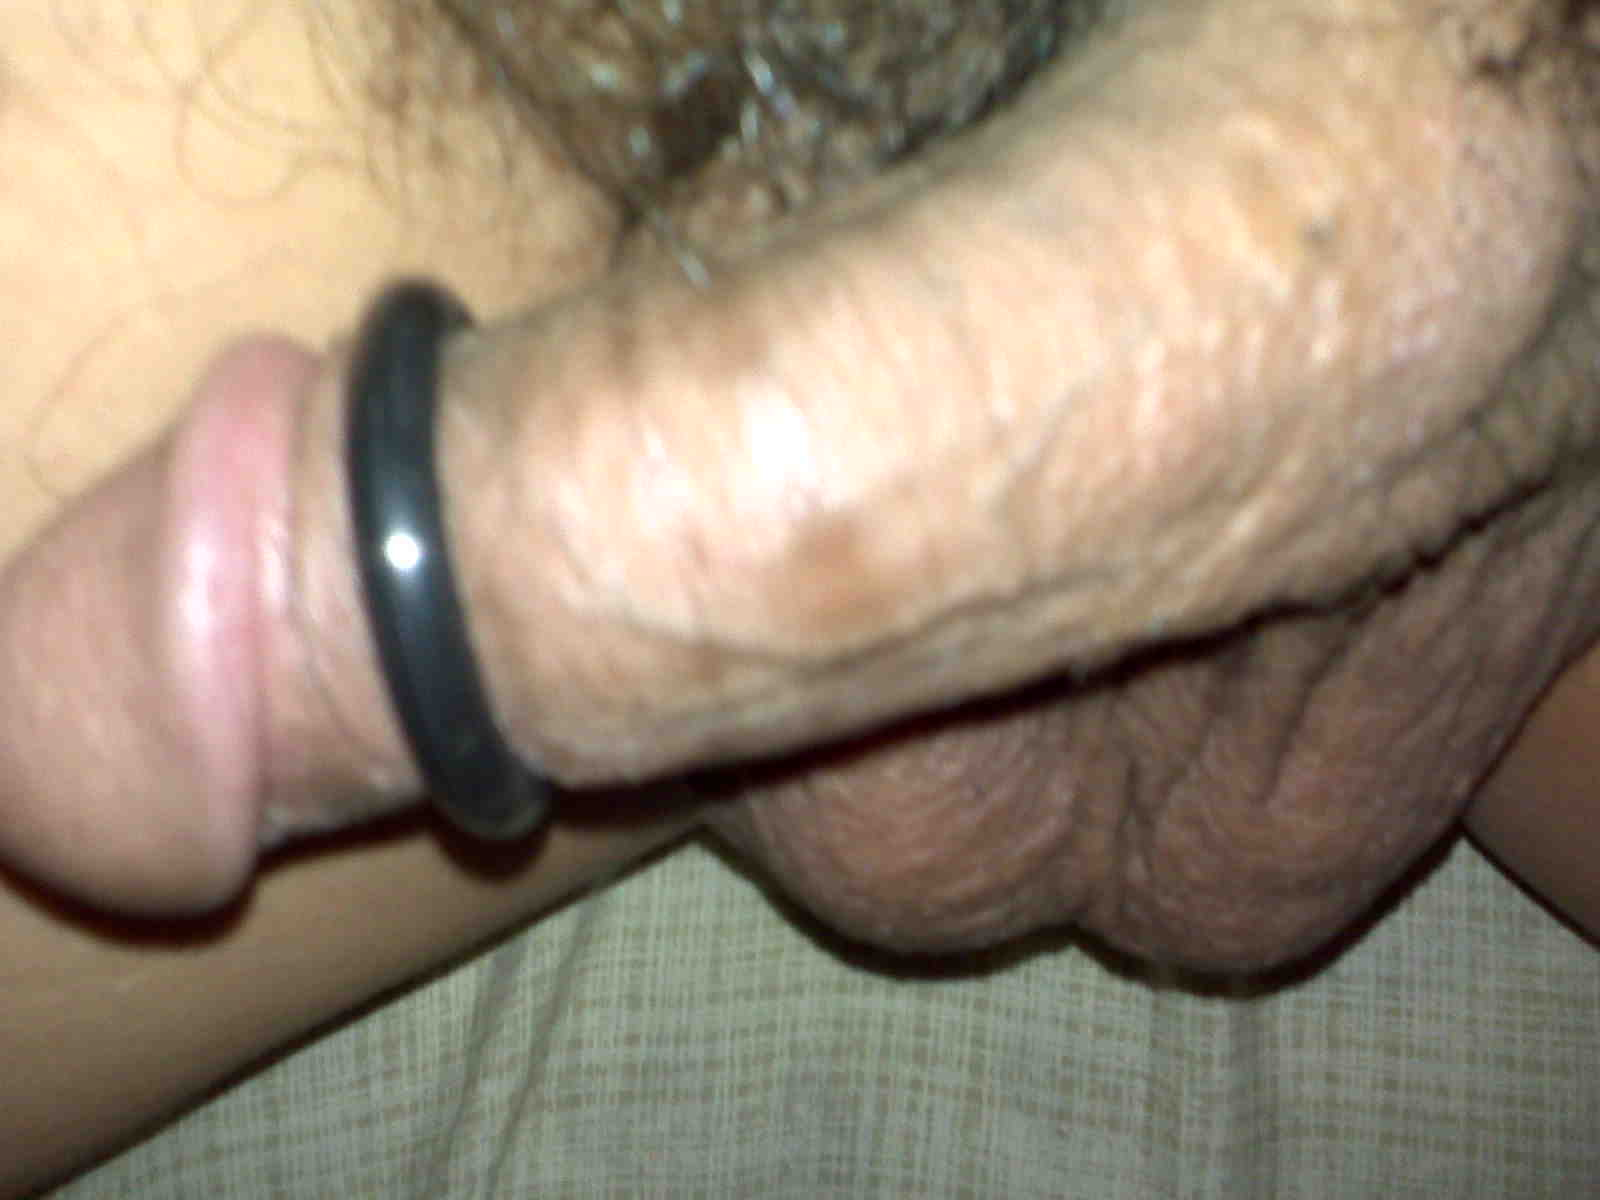 Ring Huge Cocks